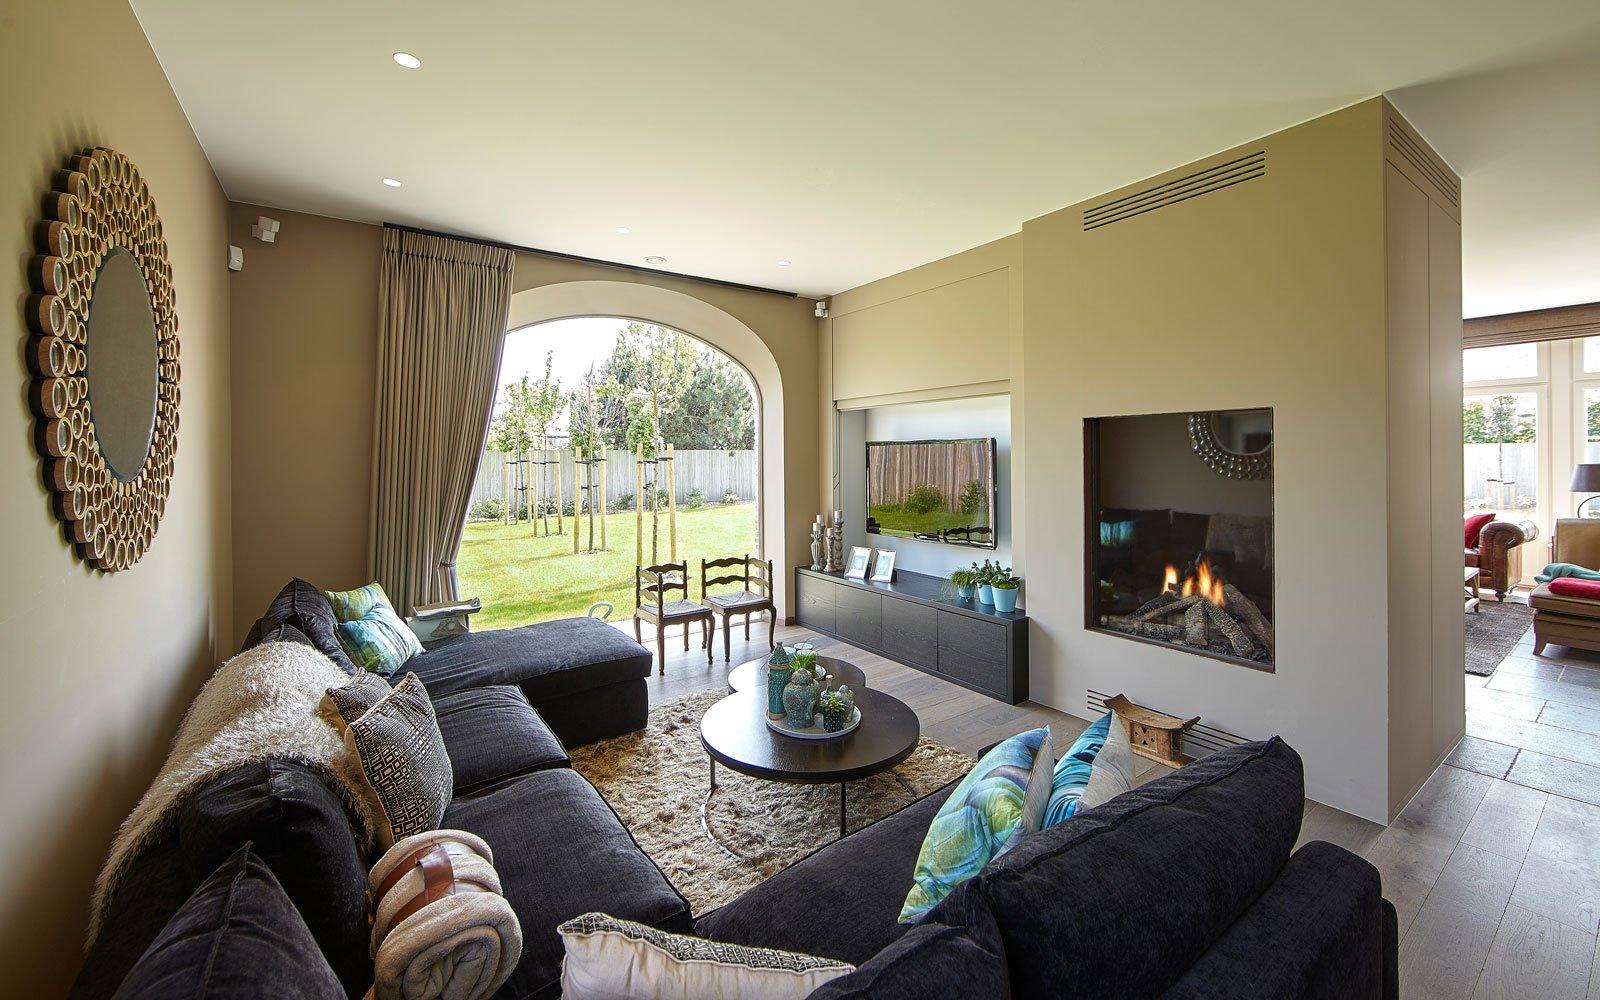 Living, woonkamer, open haard, Cosyflame, grote ramen, boogvormig, Engelse cottage, Bart François